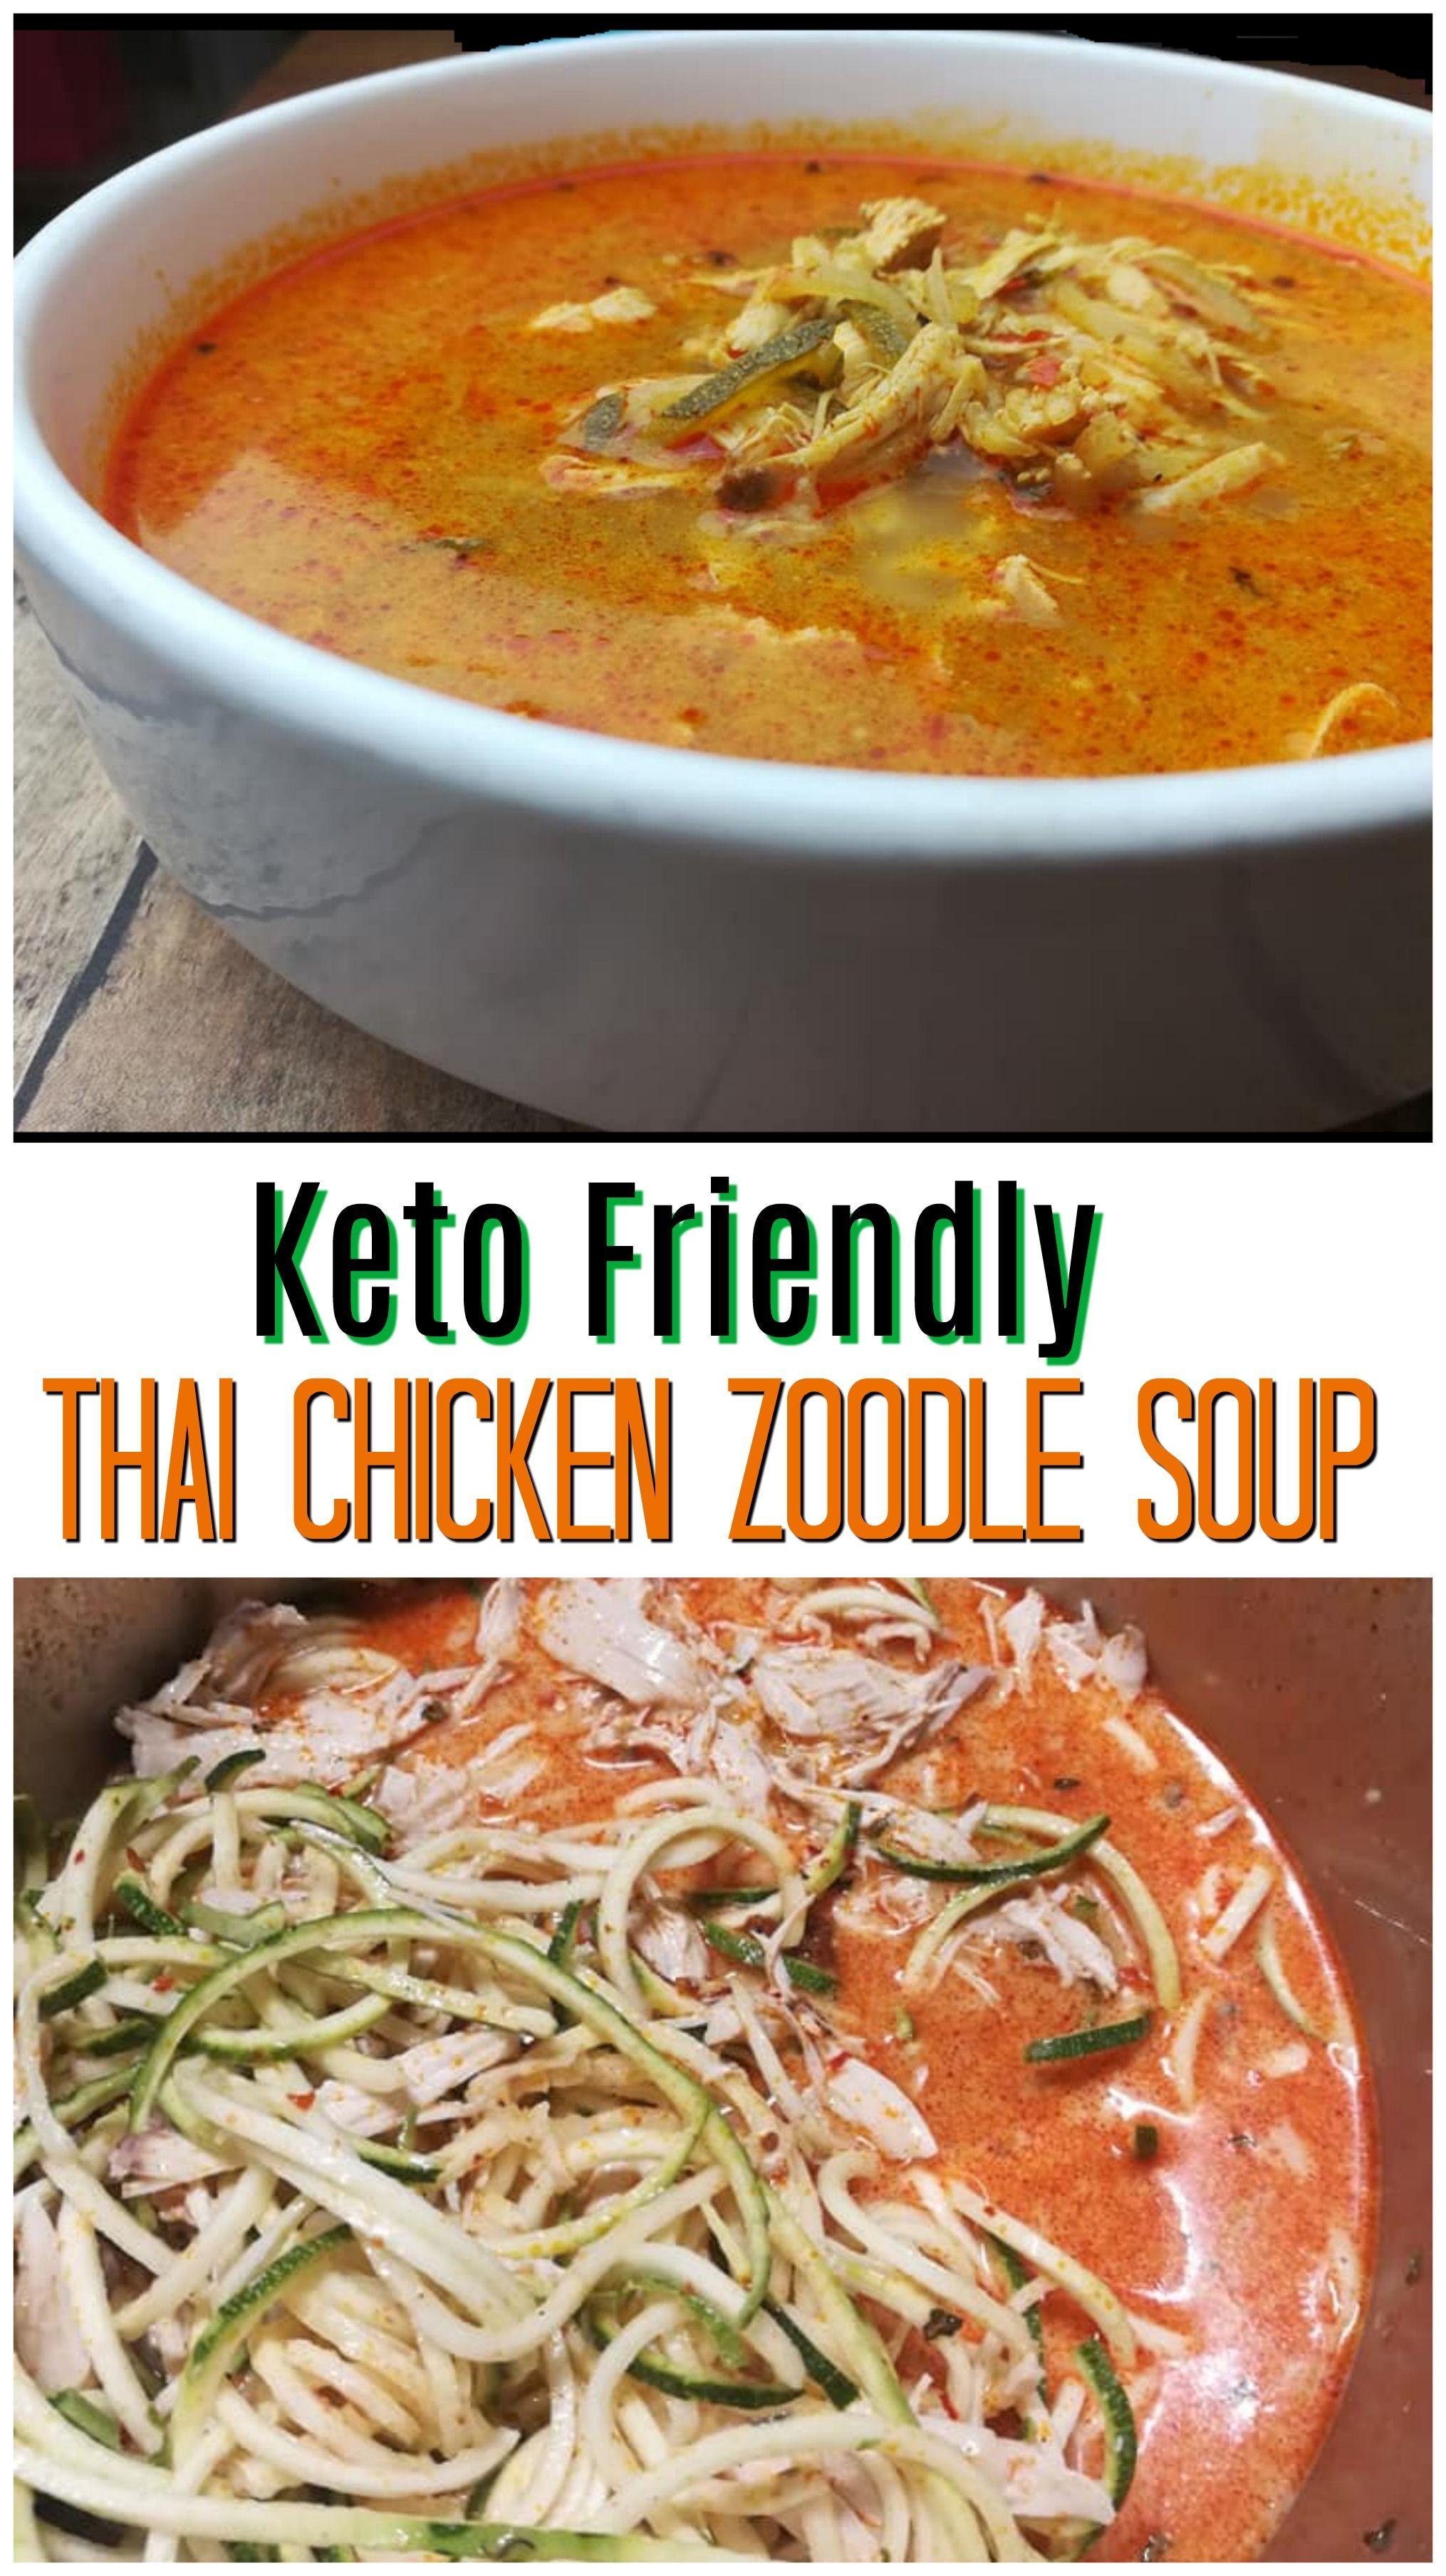 Keto friendly thai chicken zoodle soup simple pressure